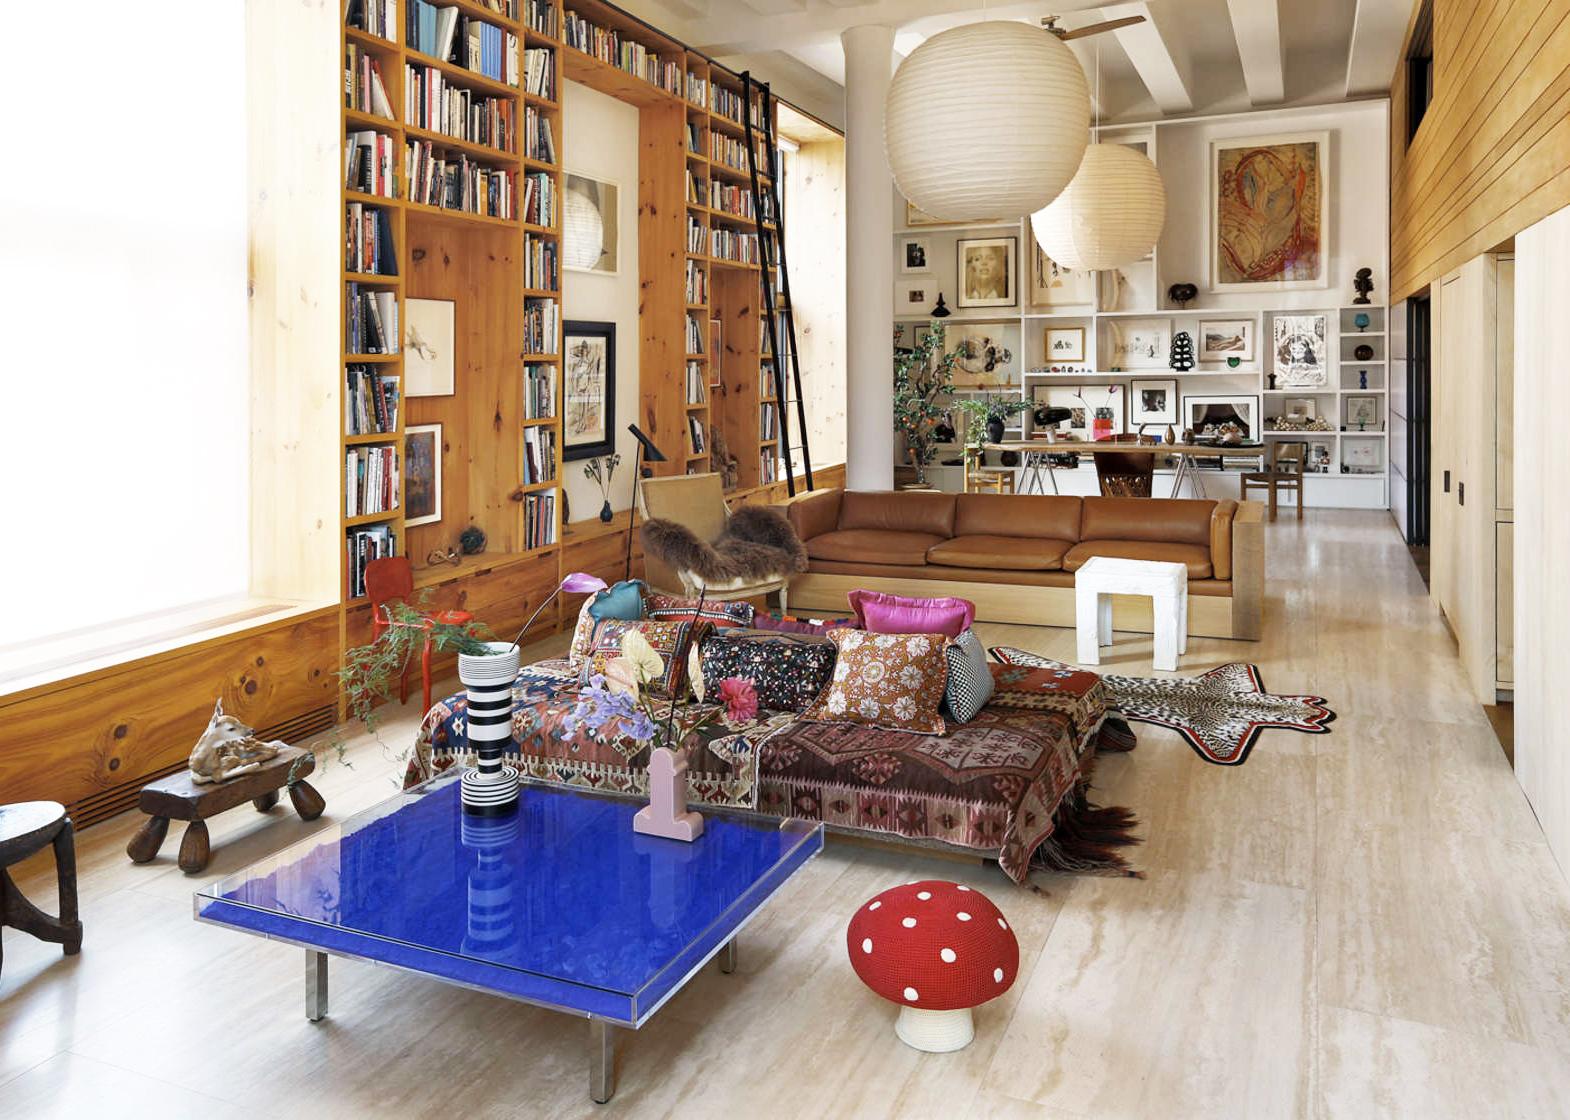 Nolita Loft Interior Boasts Floor To Ceiling Book Shelves ...